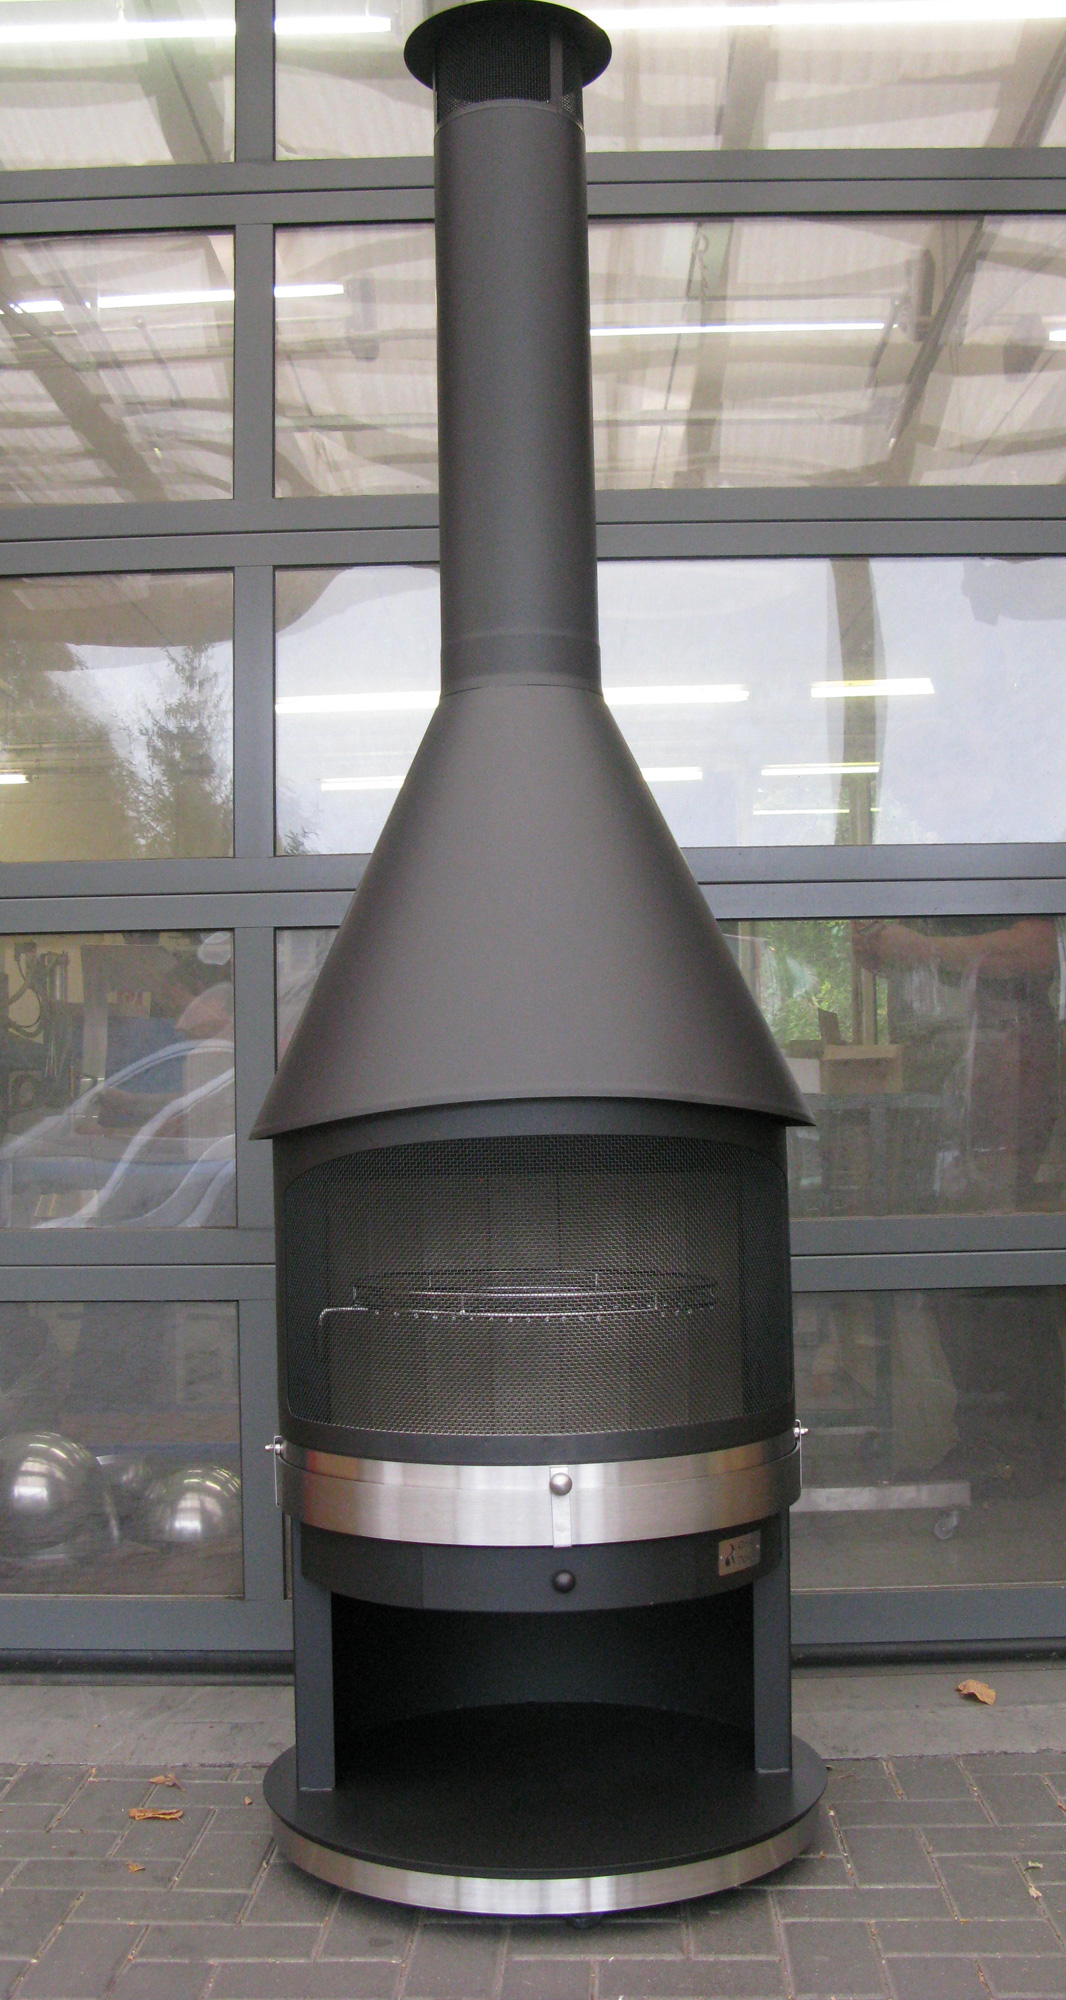 girse design grillkamin: tirol typ 2 gartenkamin grau